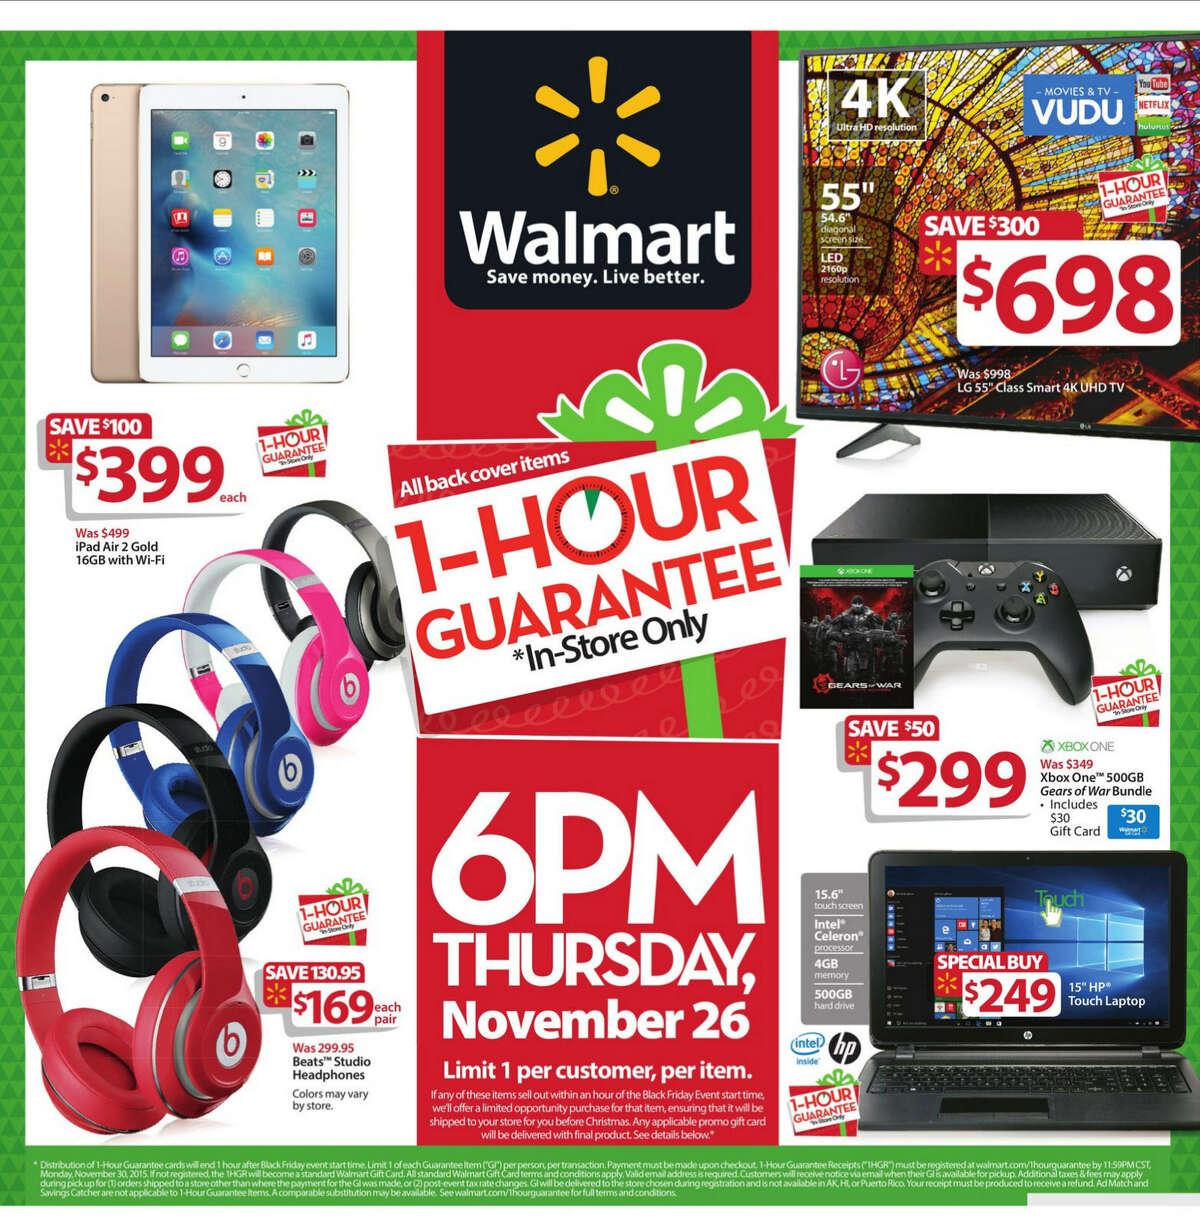 Walmart Black Friday 2015 newspaper circular (click expand button below for larger image).